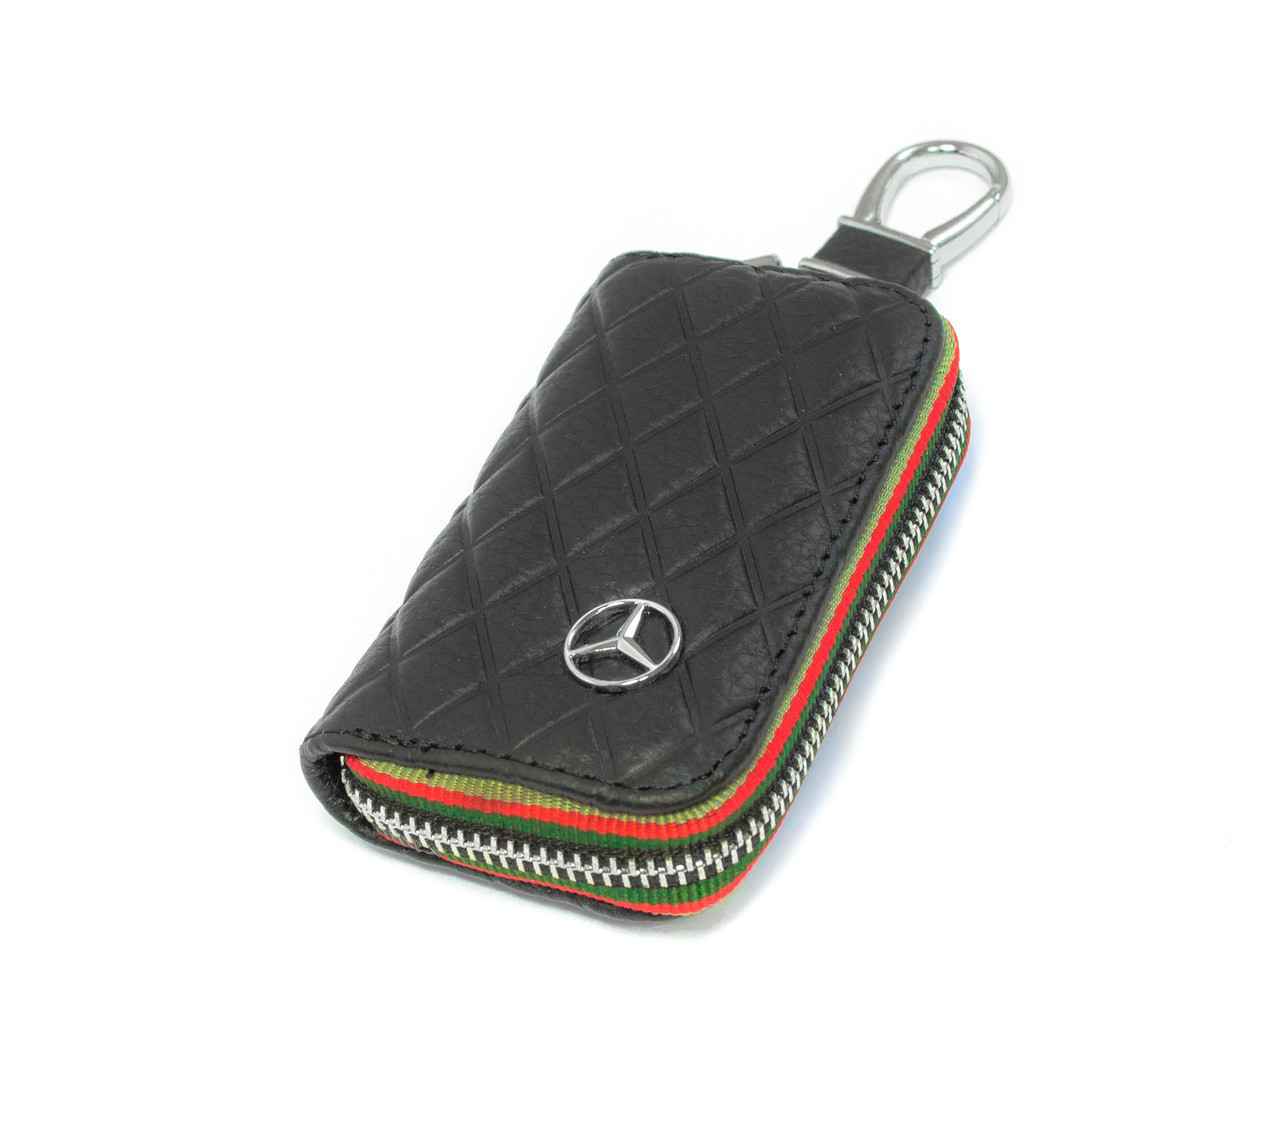 Ключница Carss с логотипом MERCEDES 02009 черная